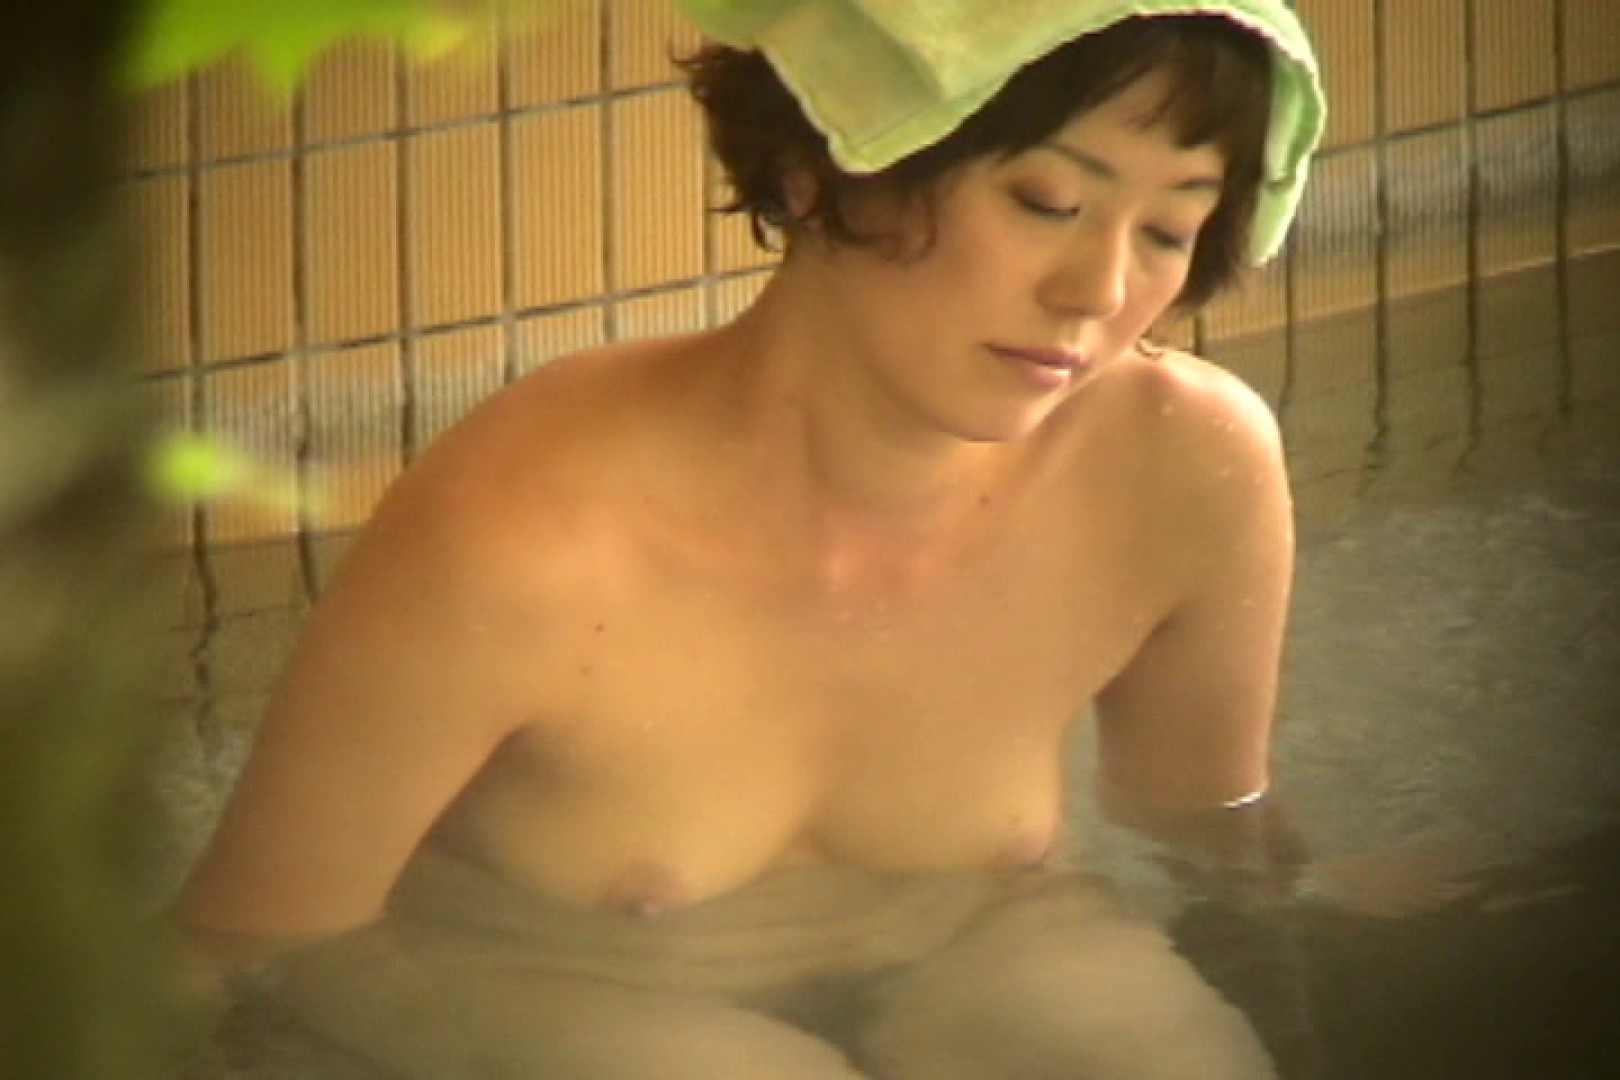 Aquaな露天風呂Vol.456 盗撮 | HなOL  102pic 90